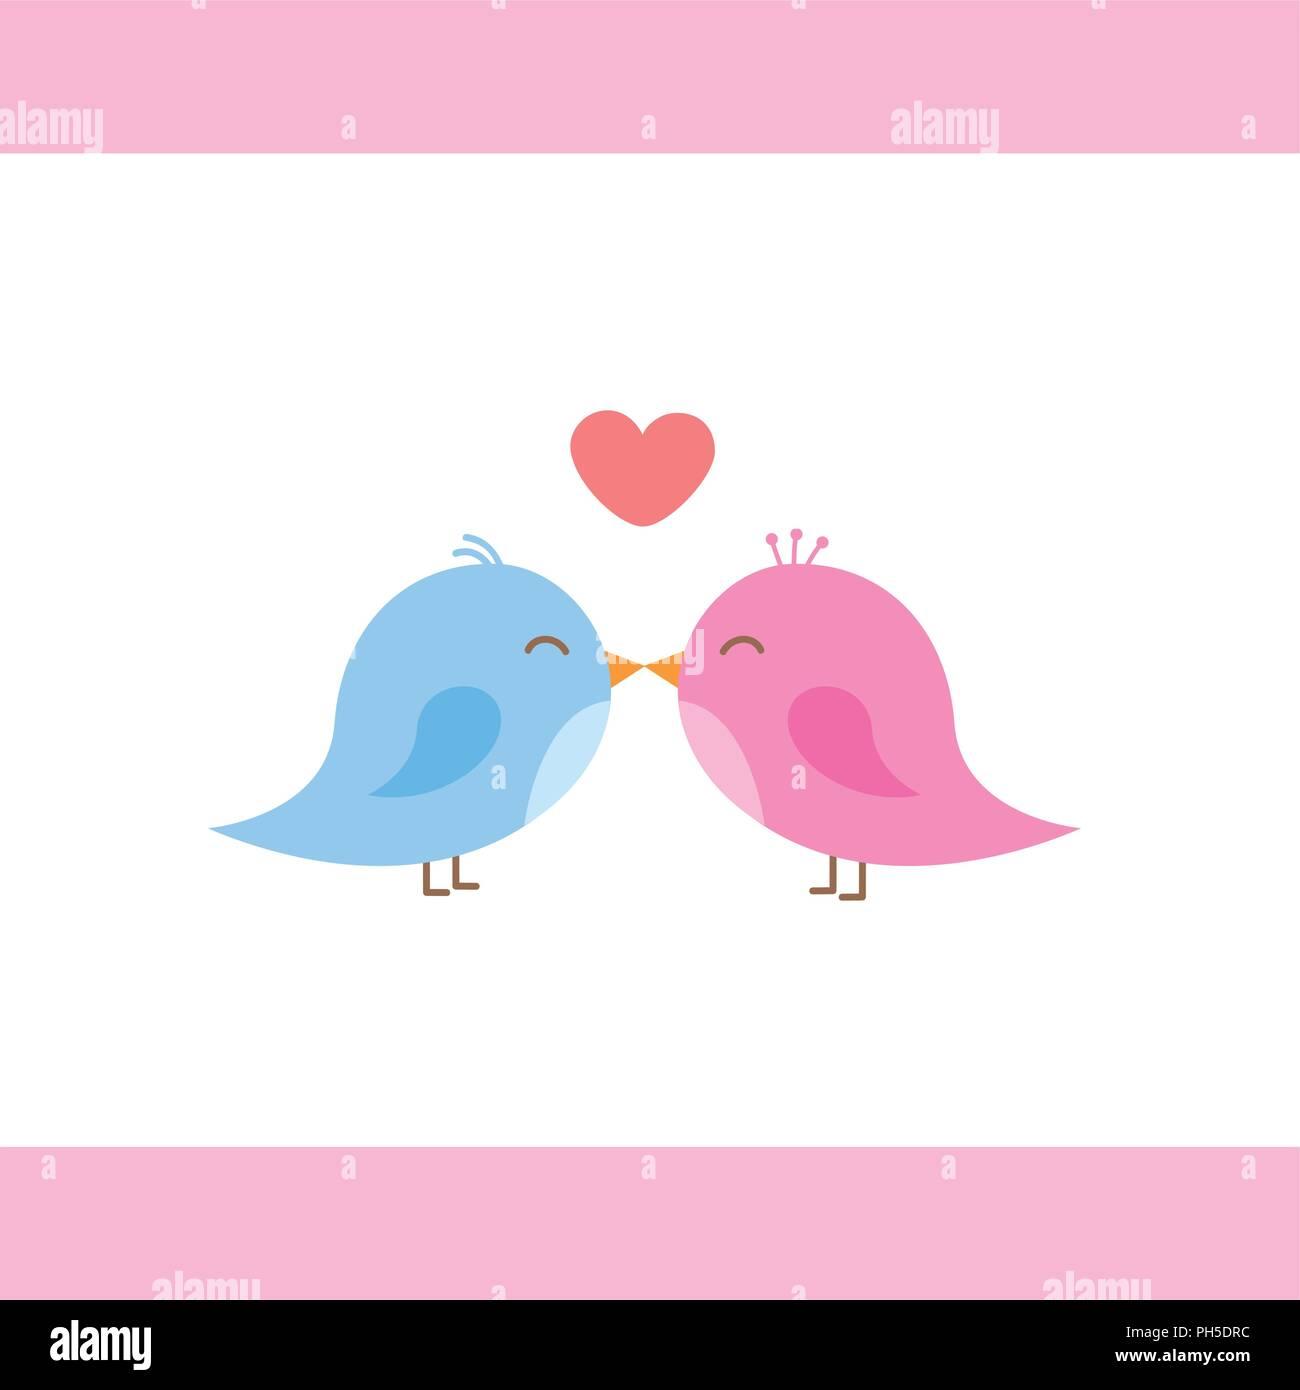 Two Cute Birds Are Kissing Cartoon Vector Illustration Eps10 Stock Vector Image Art Alamy